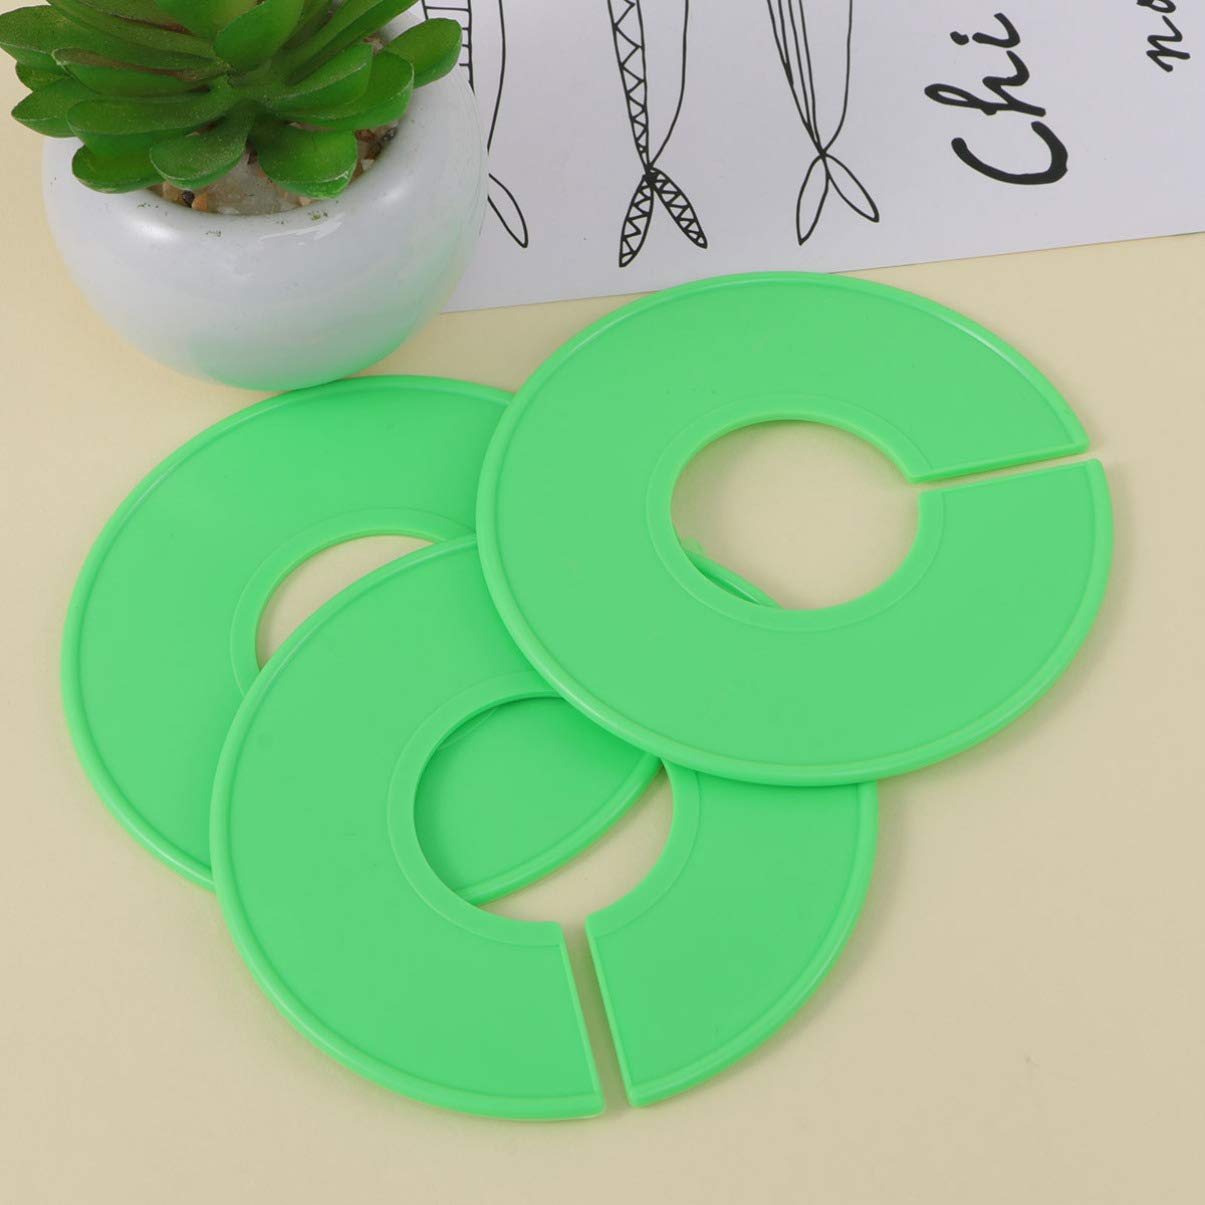 Cabilock 3 piezas separador tama/ño armario ropa vac/ía estante divisores de tama/ño percha redonda anillo de clasificaci/ón para cintura accesorios de ropa-verde